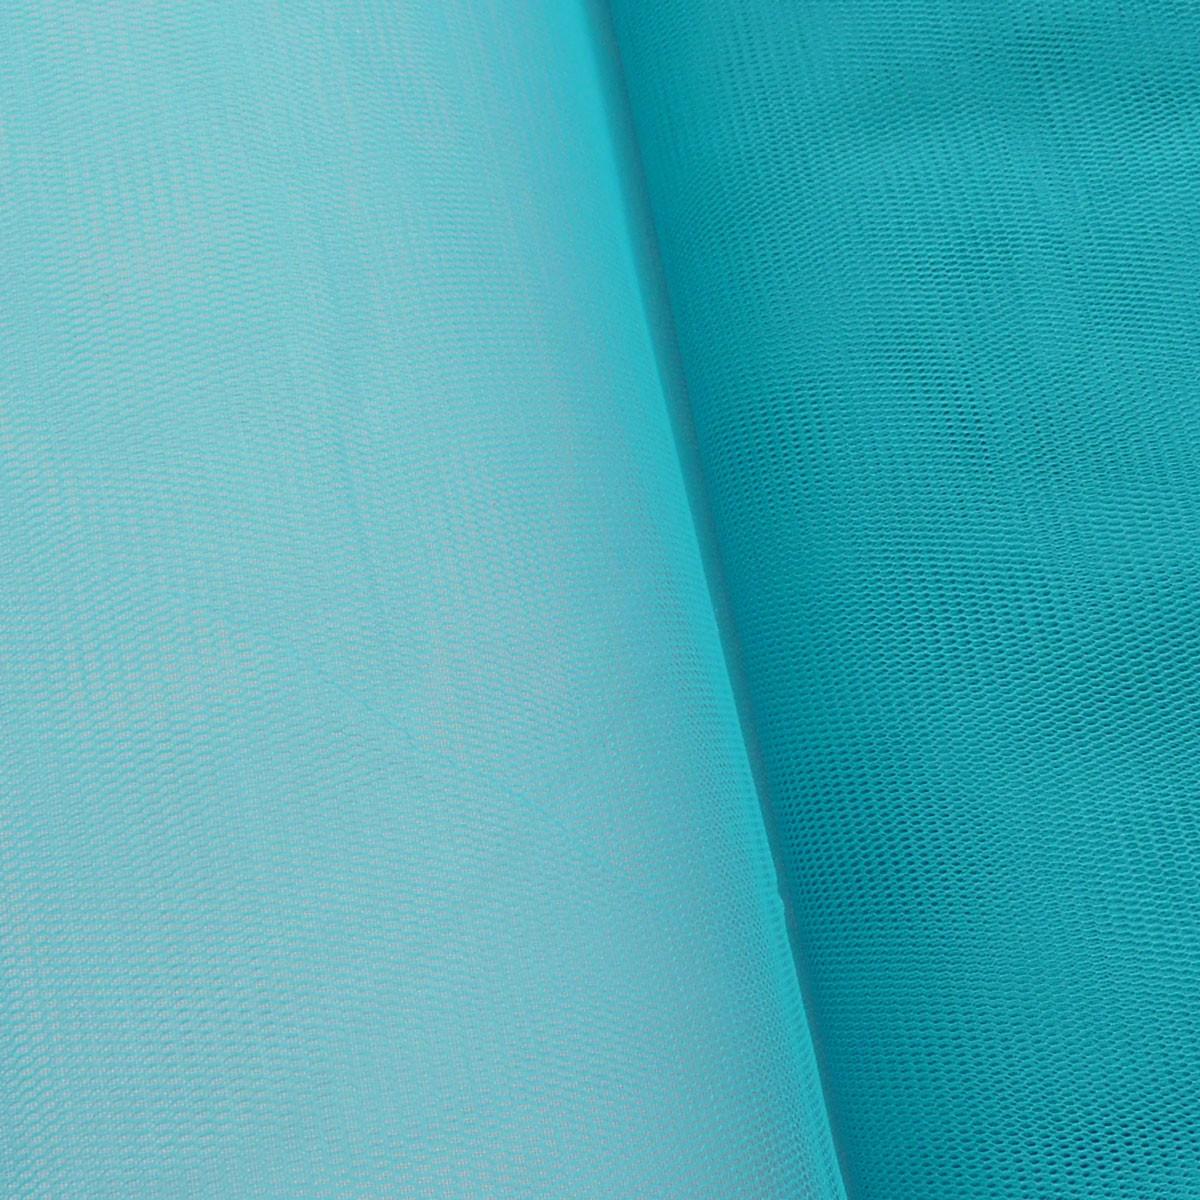 Kreativstoff Tüll Polyester türkis 1,4m Breite